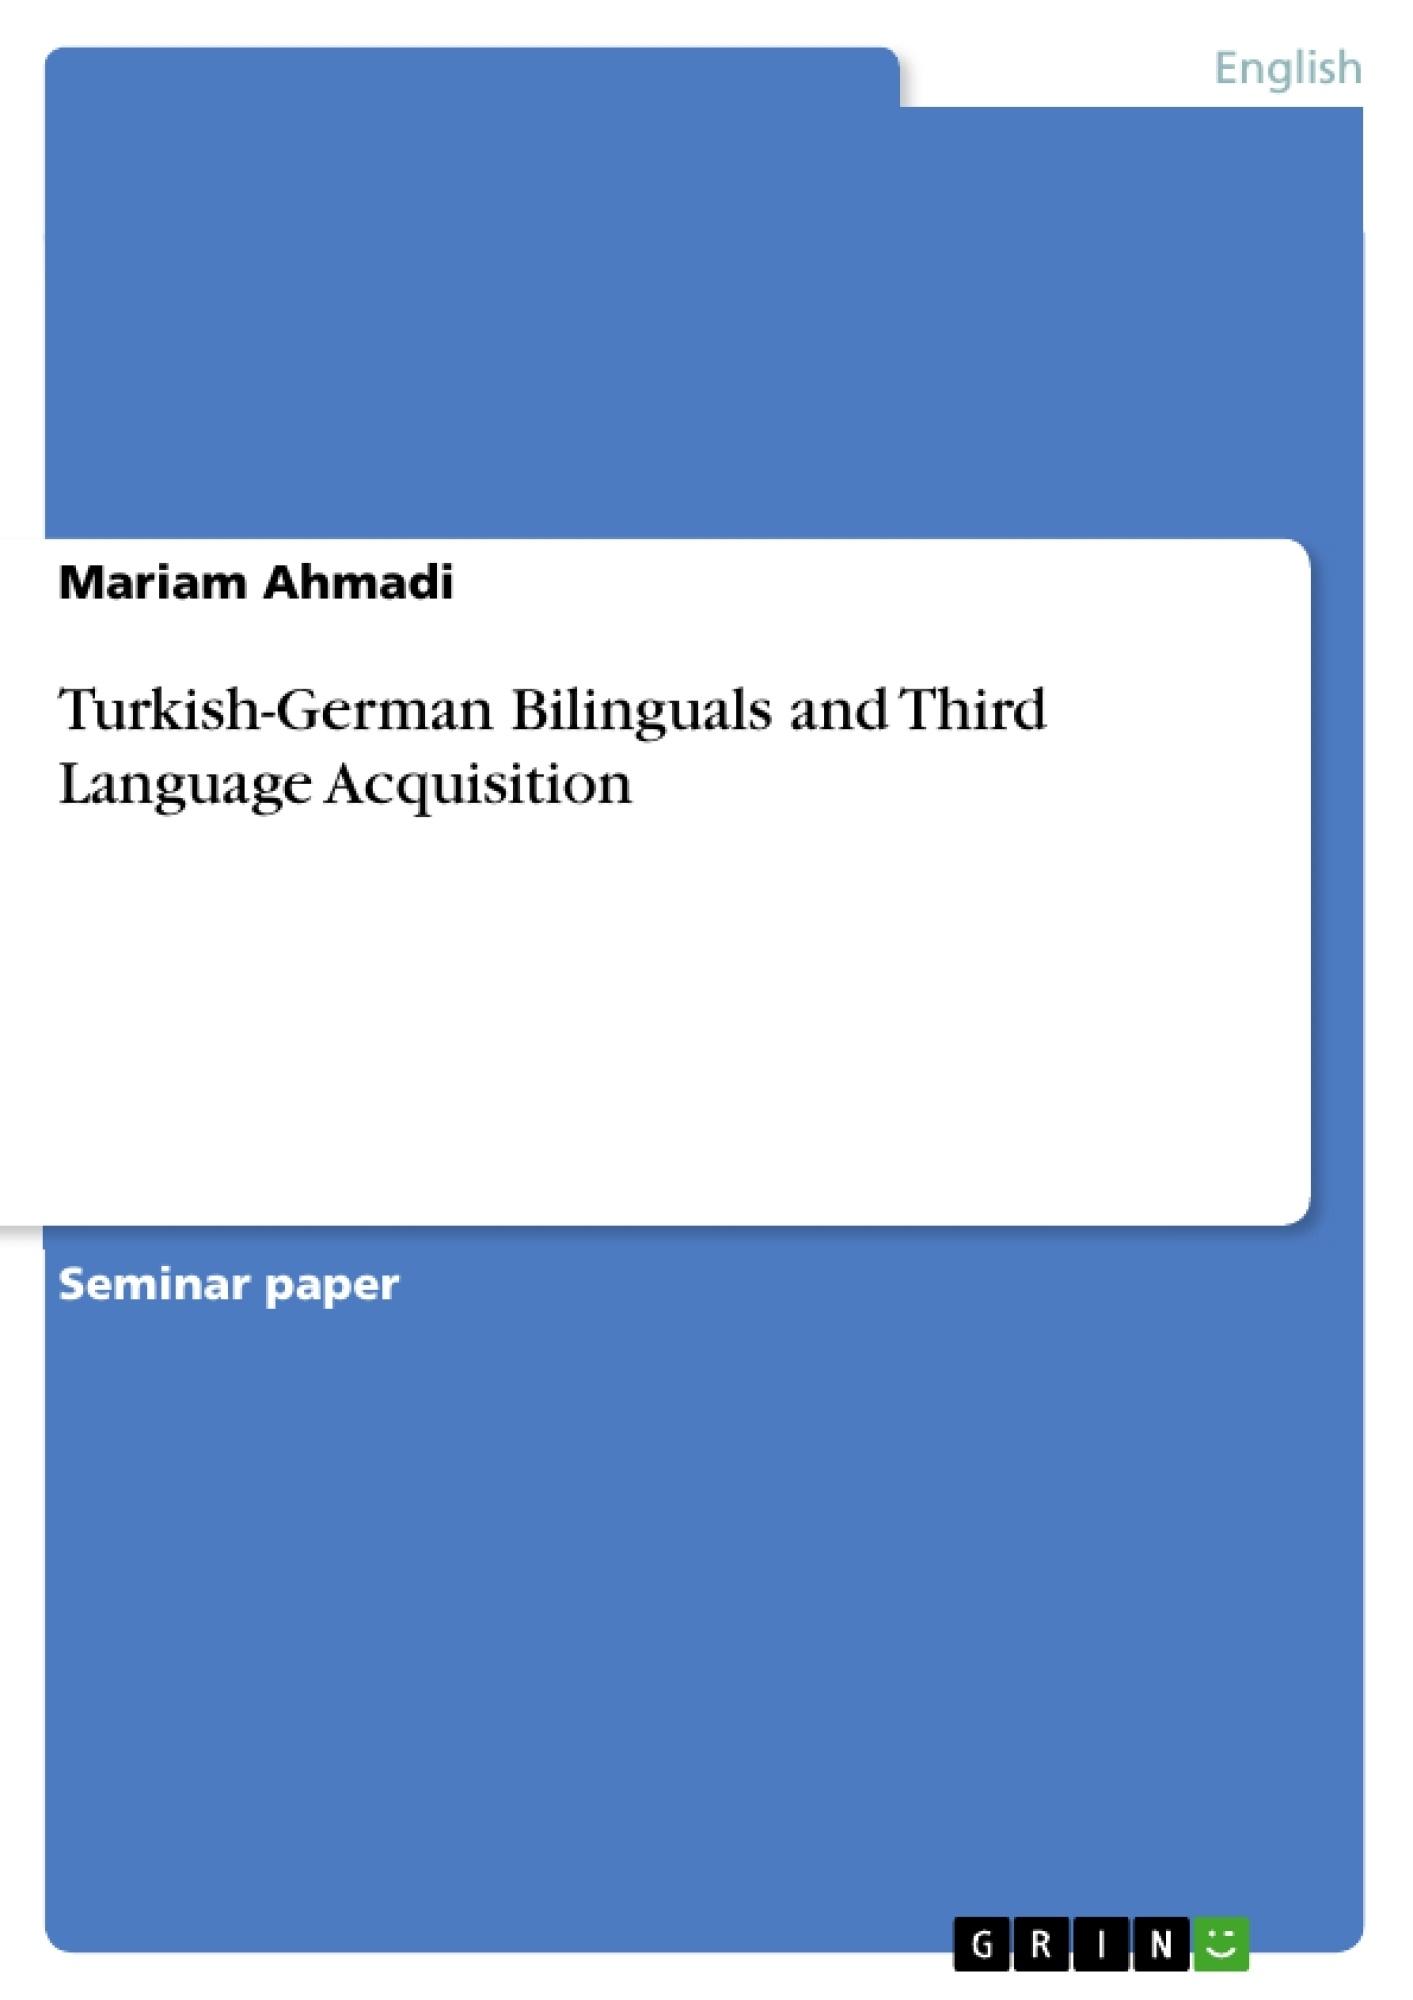 Title: Turkish-German Bilinguals and Third Language Acquisition